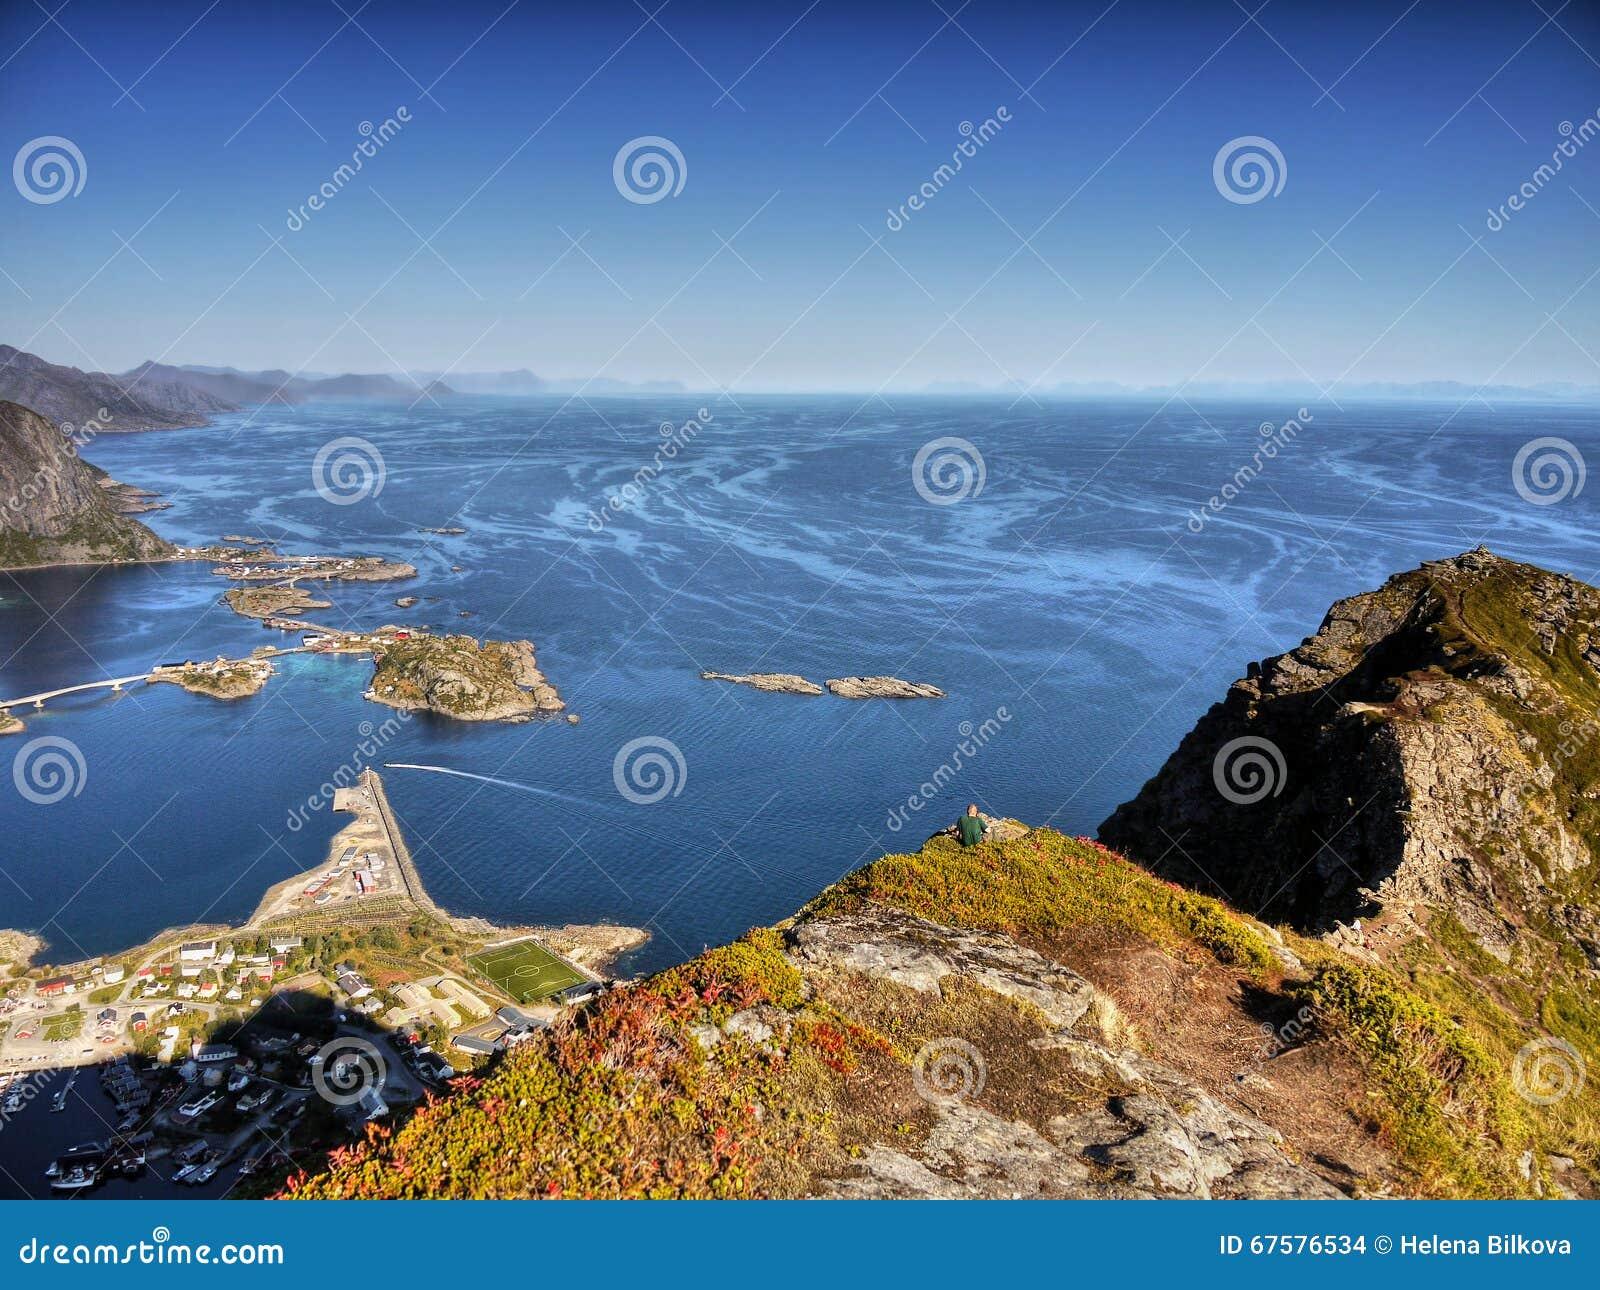 Lofoten Islands, Tours Cruises Norway Stock Photo - Image ...